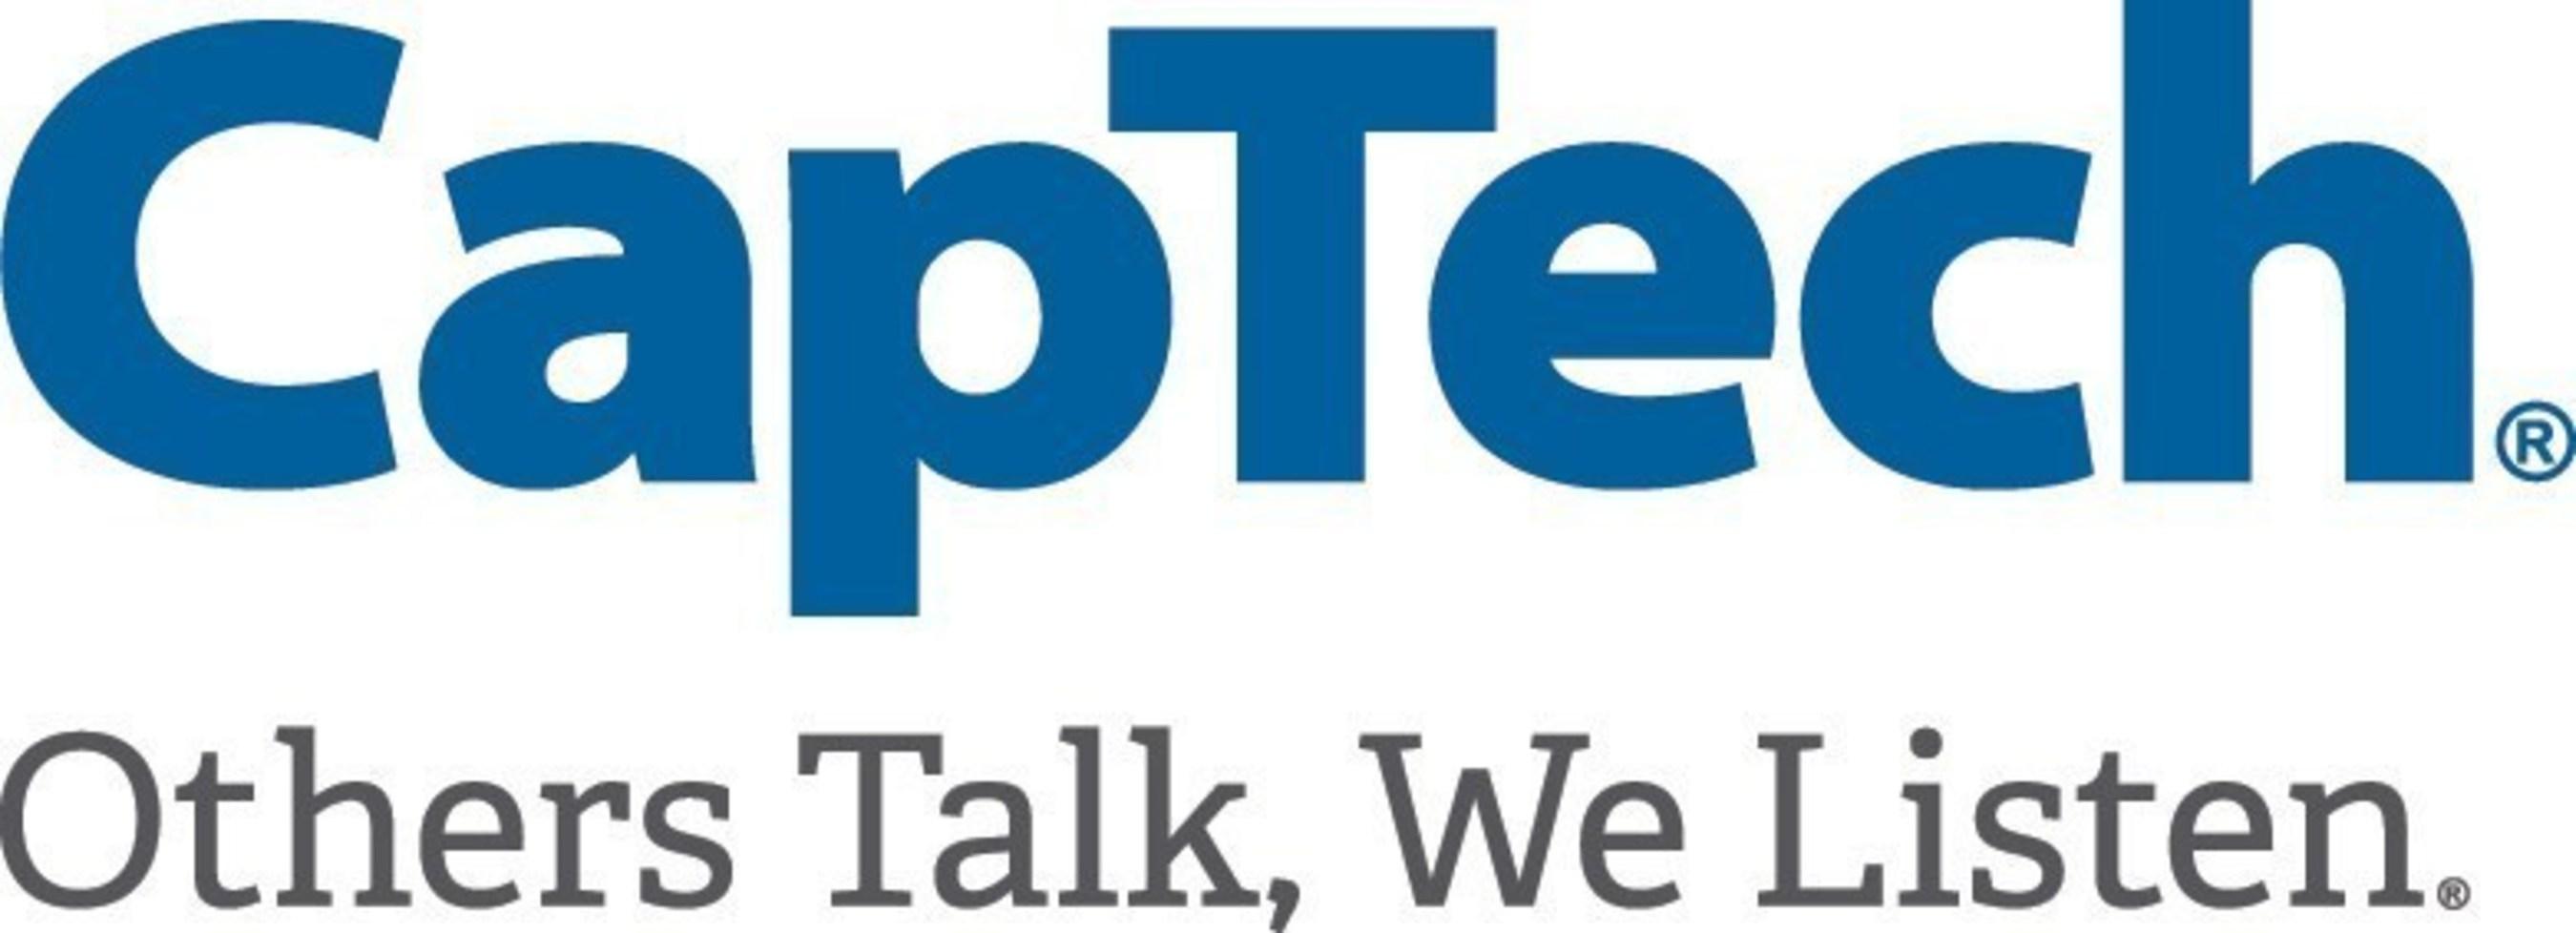 CapTech Ventures, Inc.